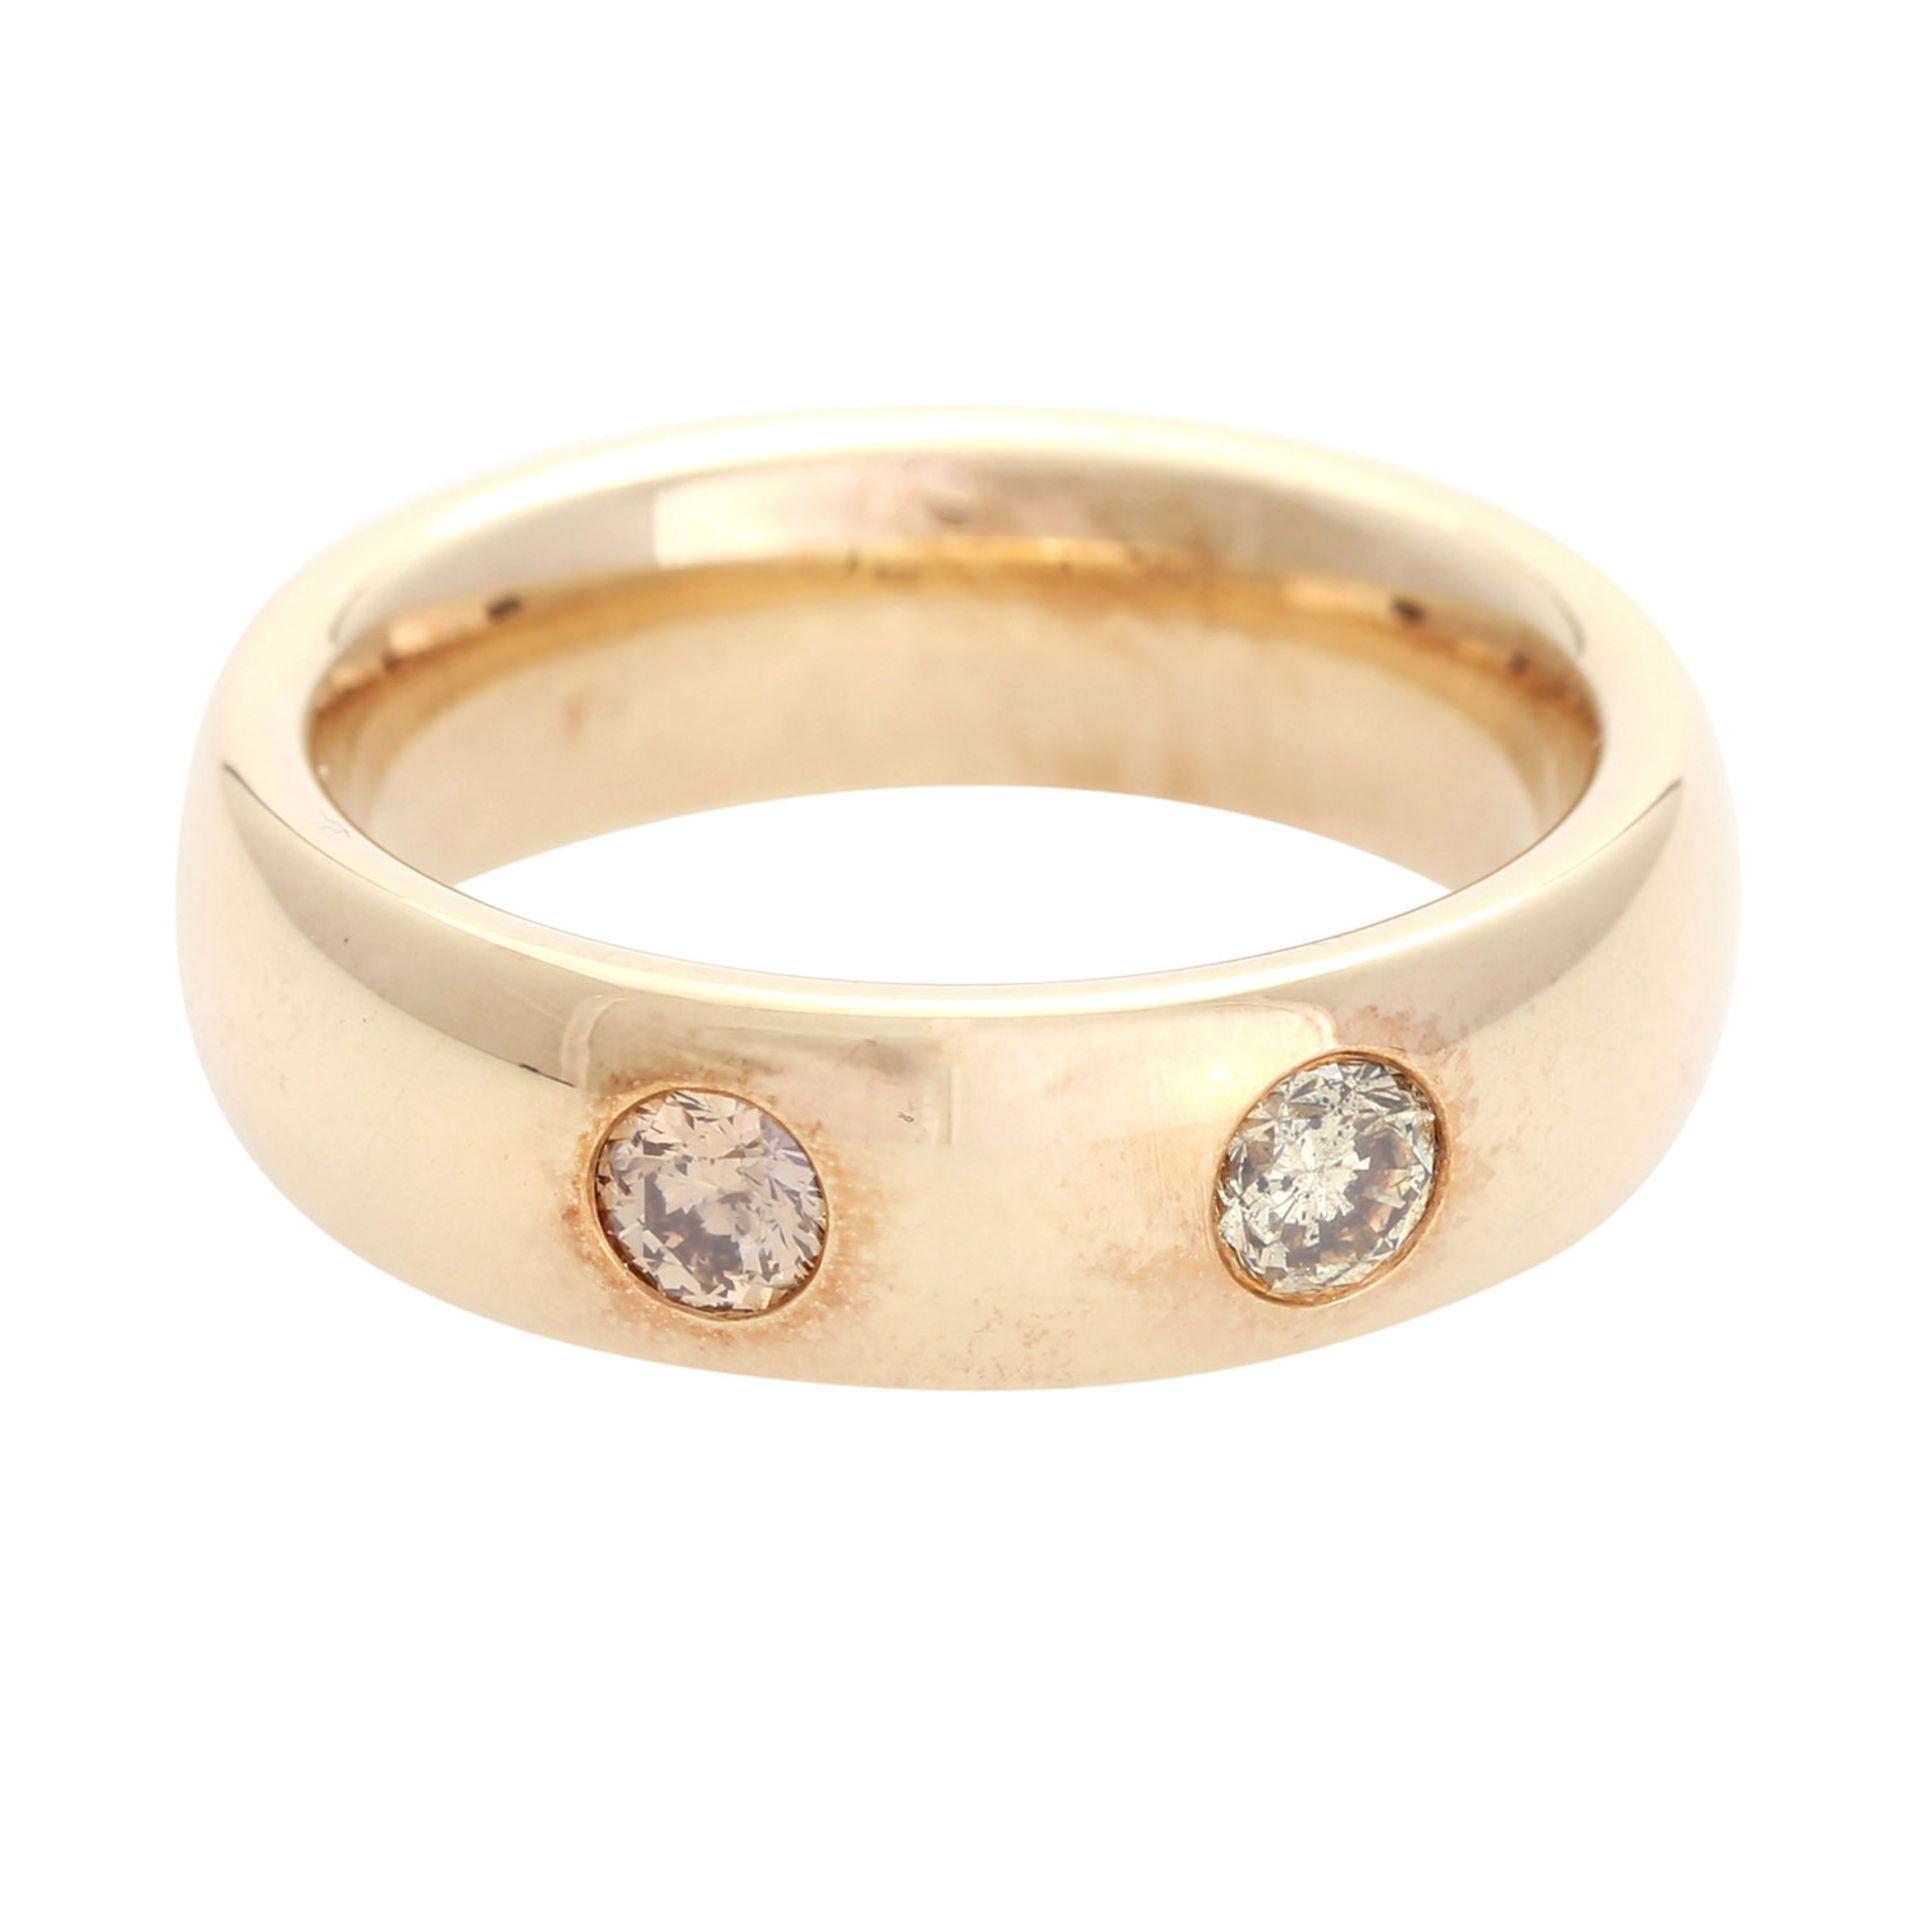 Los 175 - Ring mit 2 Diamanten, zus. ca. 0,5 ct, braun - gelbbraun / PI, GG 18K, RW 62, massiver Bandring.